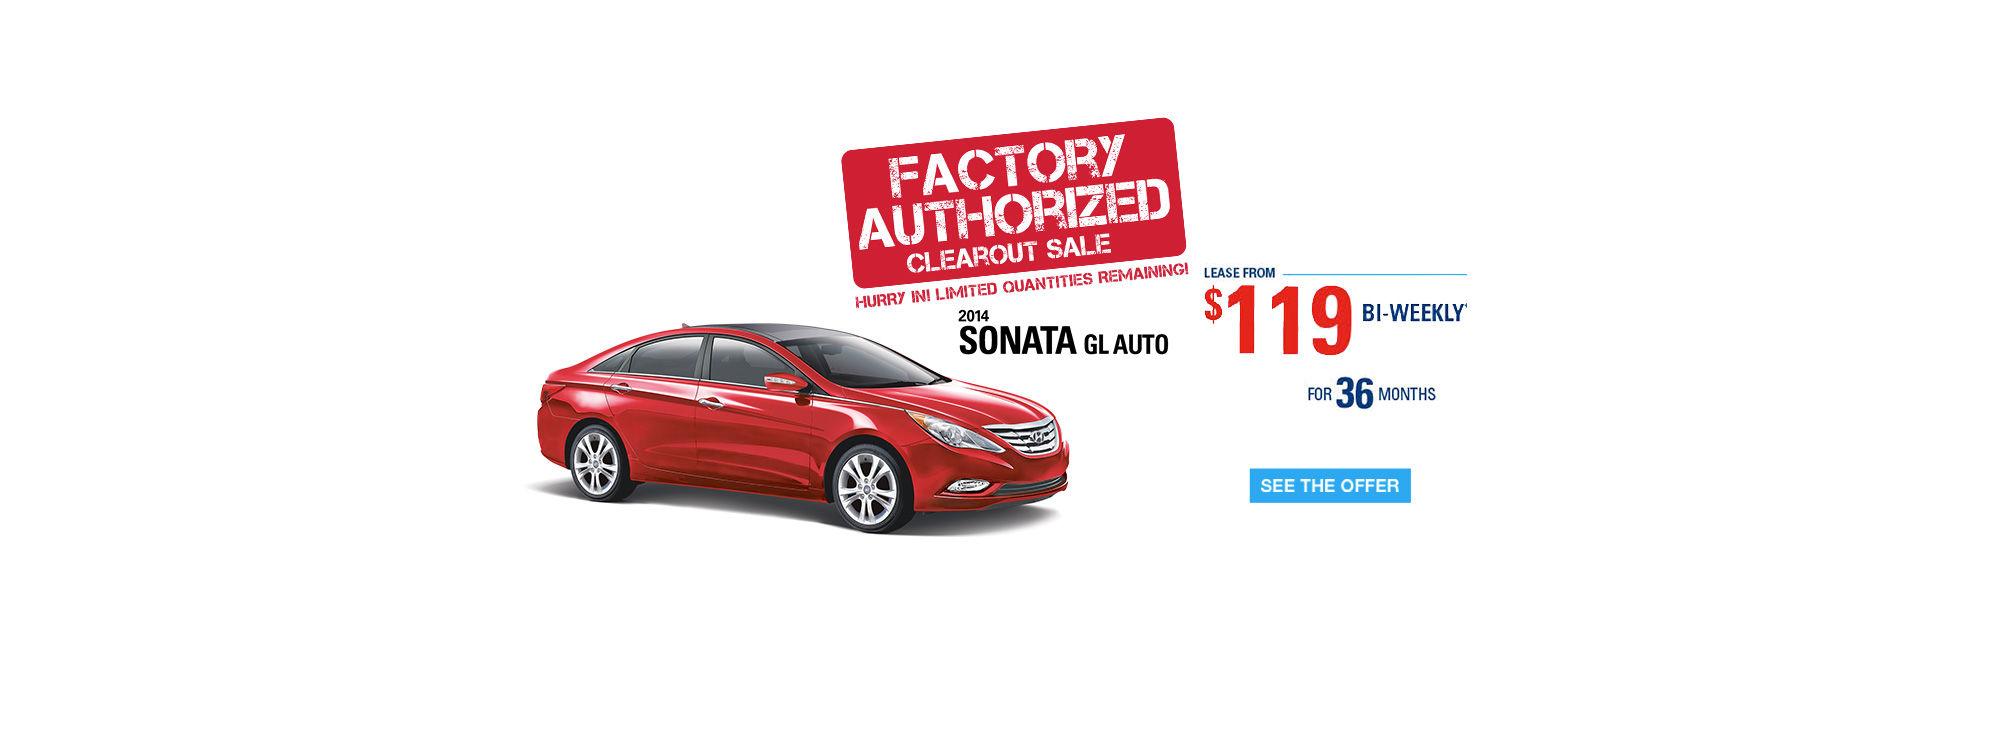 Sonata - Factory Authorized